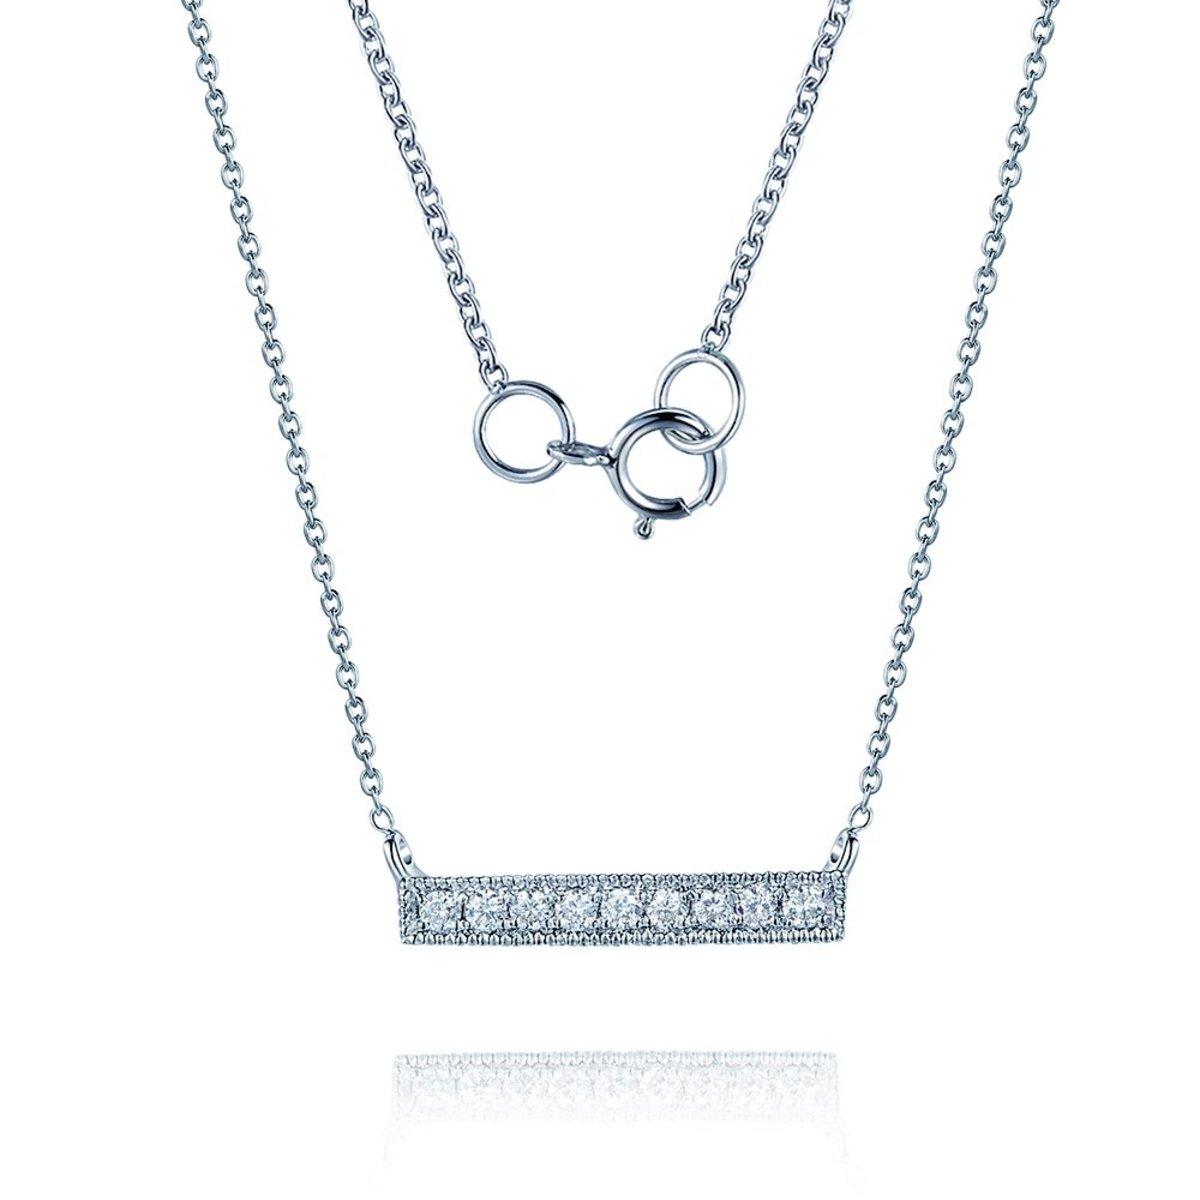 18K White Gold Diamond Bar Necklace (0.07 ct. tw.)